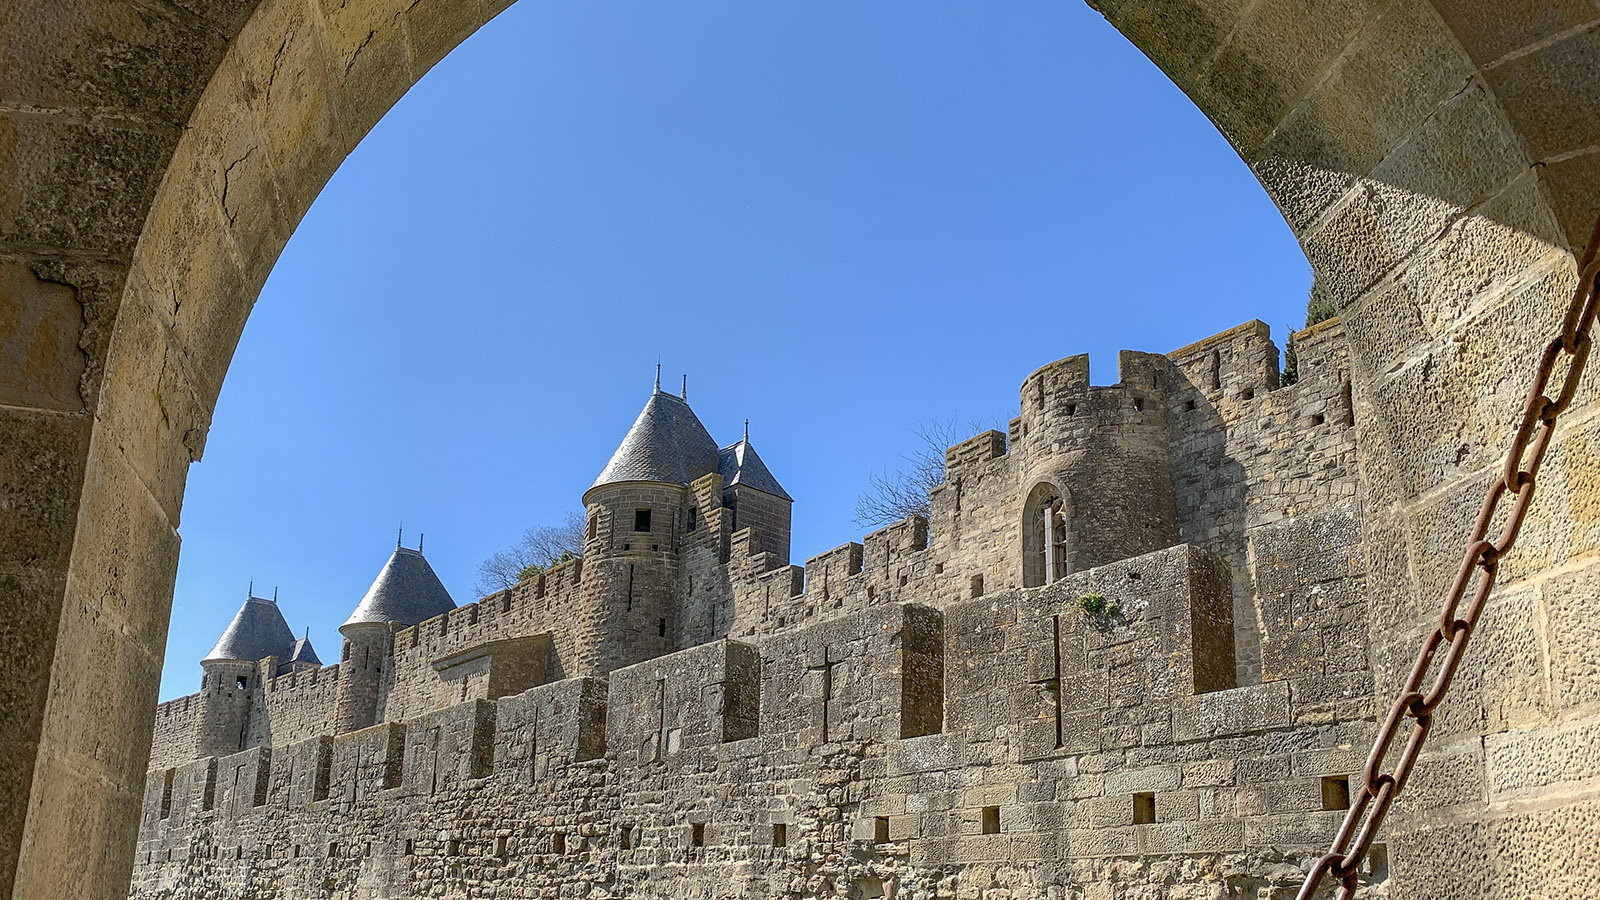 Cité von Carcassonne. Foto: Hilke Maunder